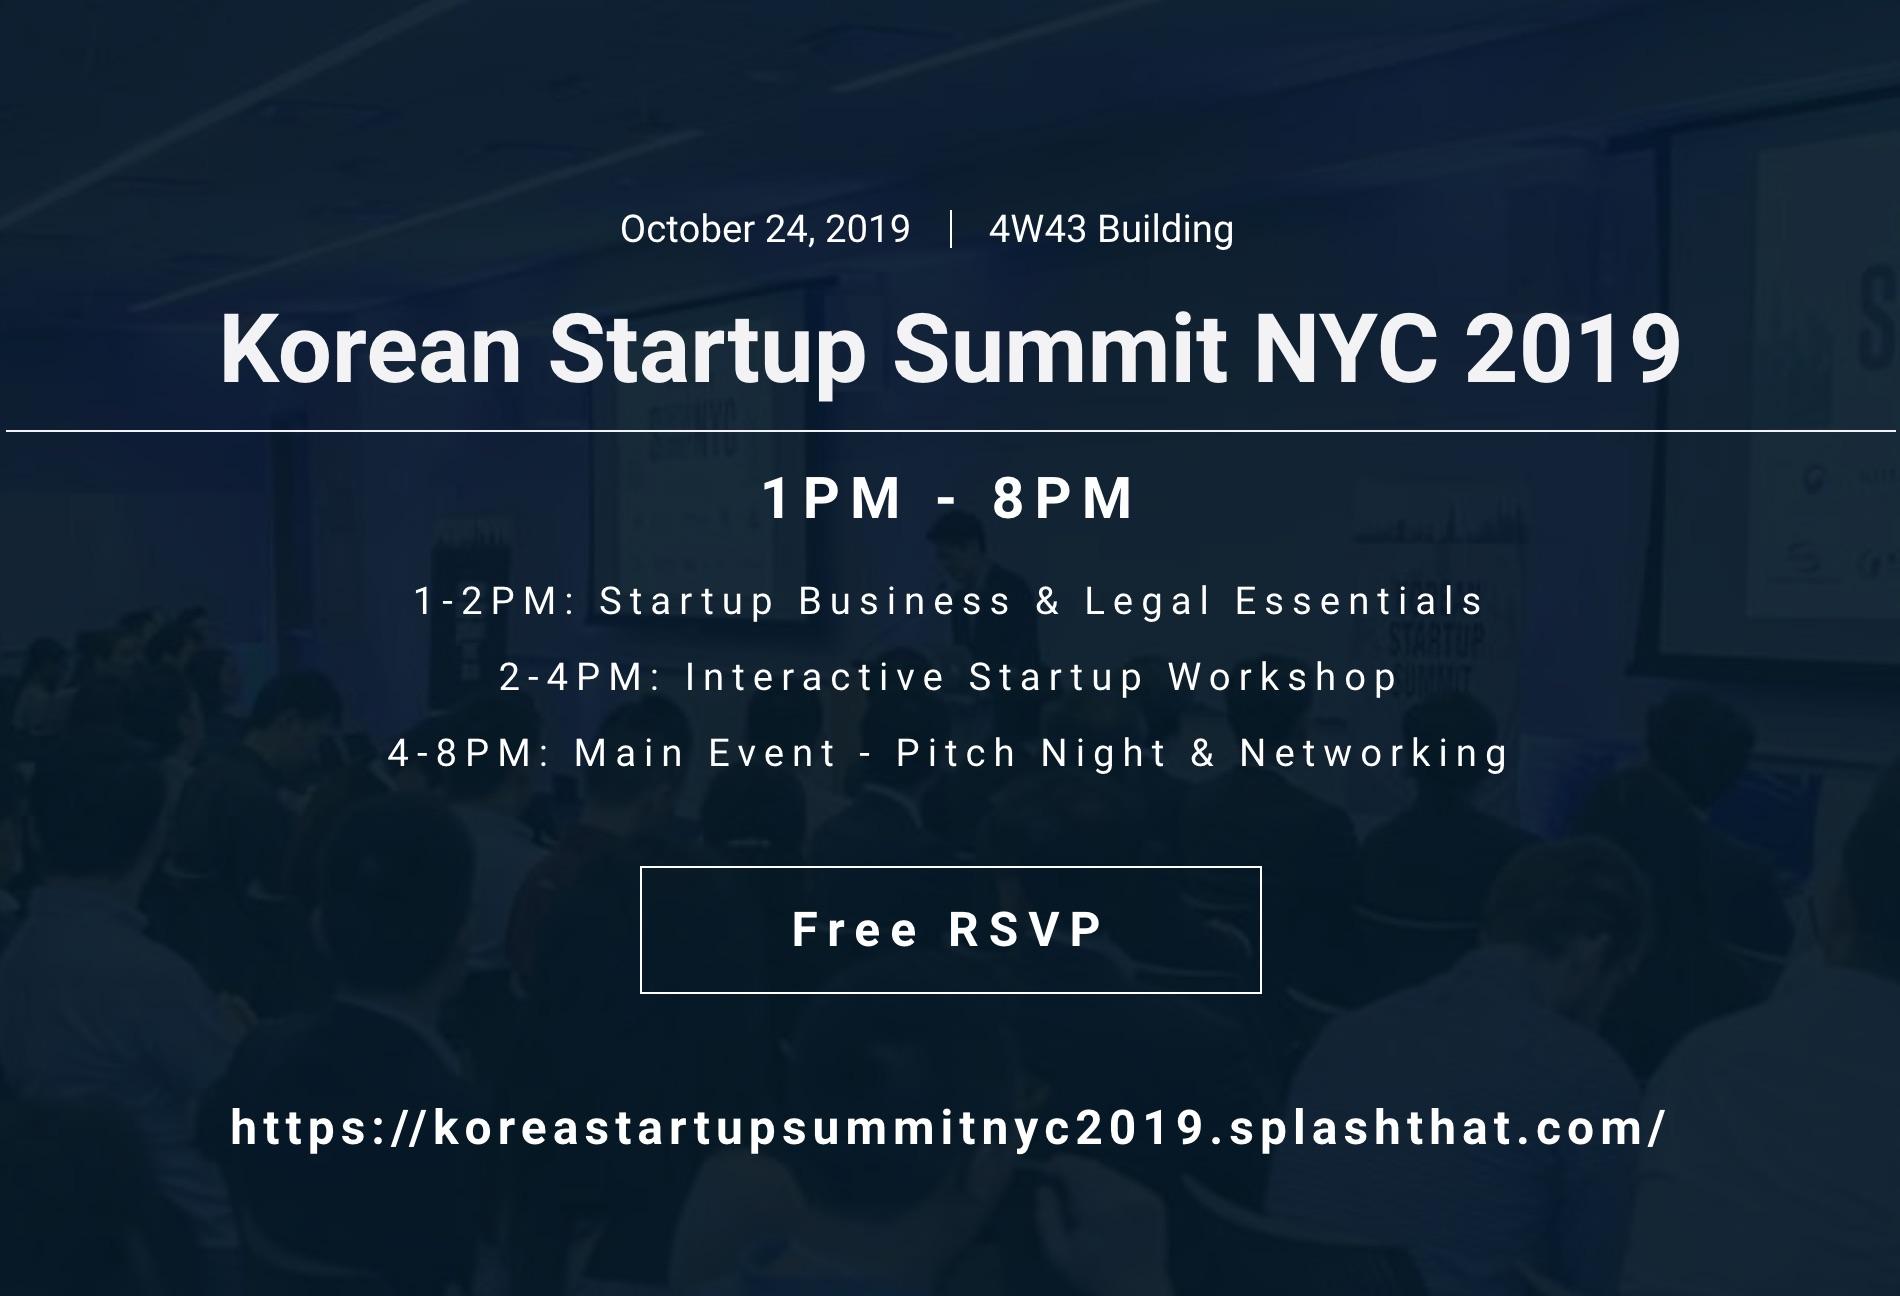 Korean Startups & Entrepreneurs (KSE) - Korean Startup Summit NYC 2019